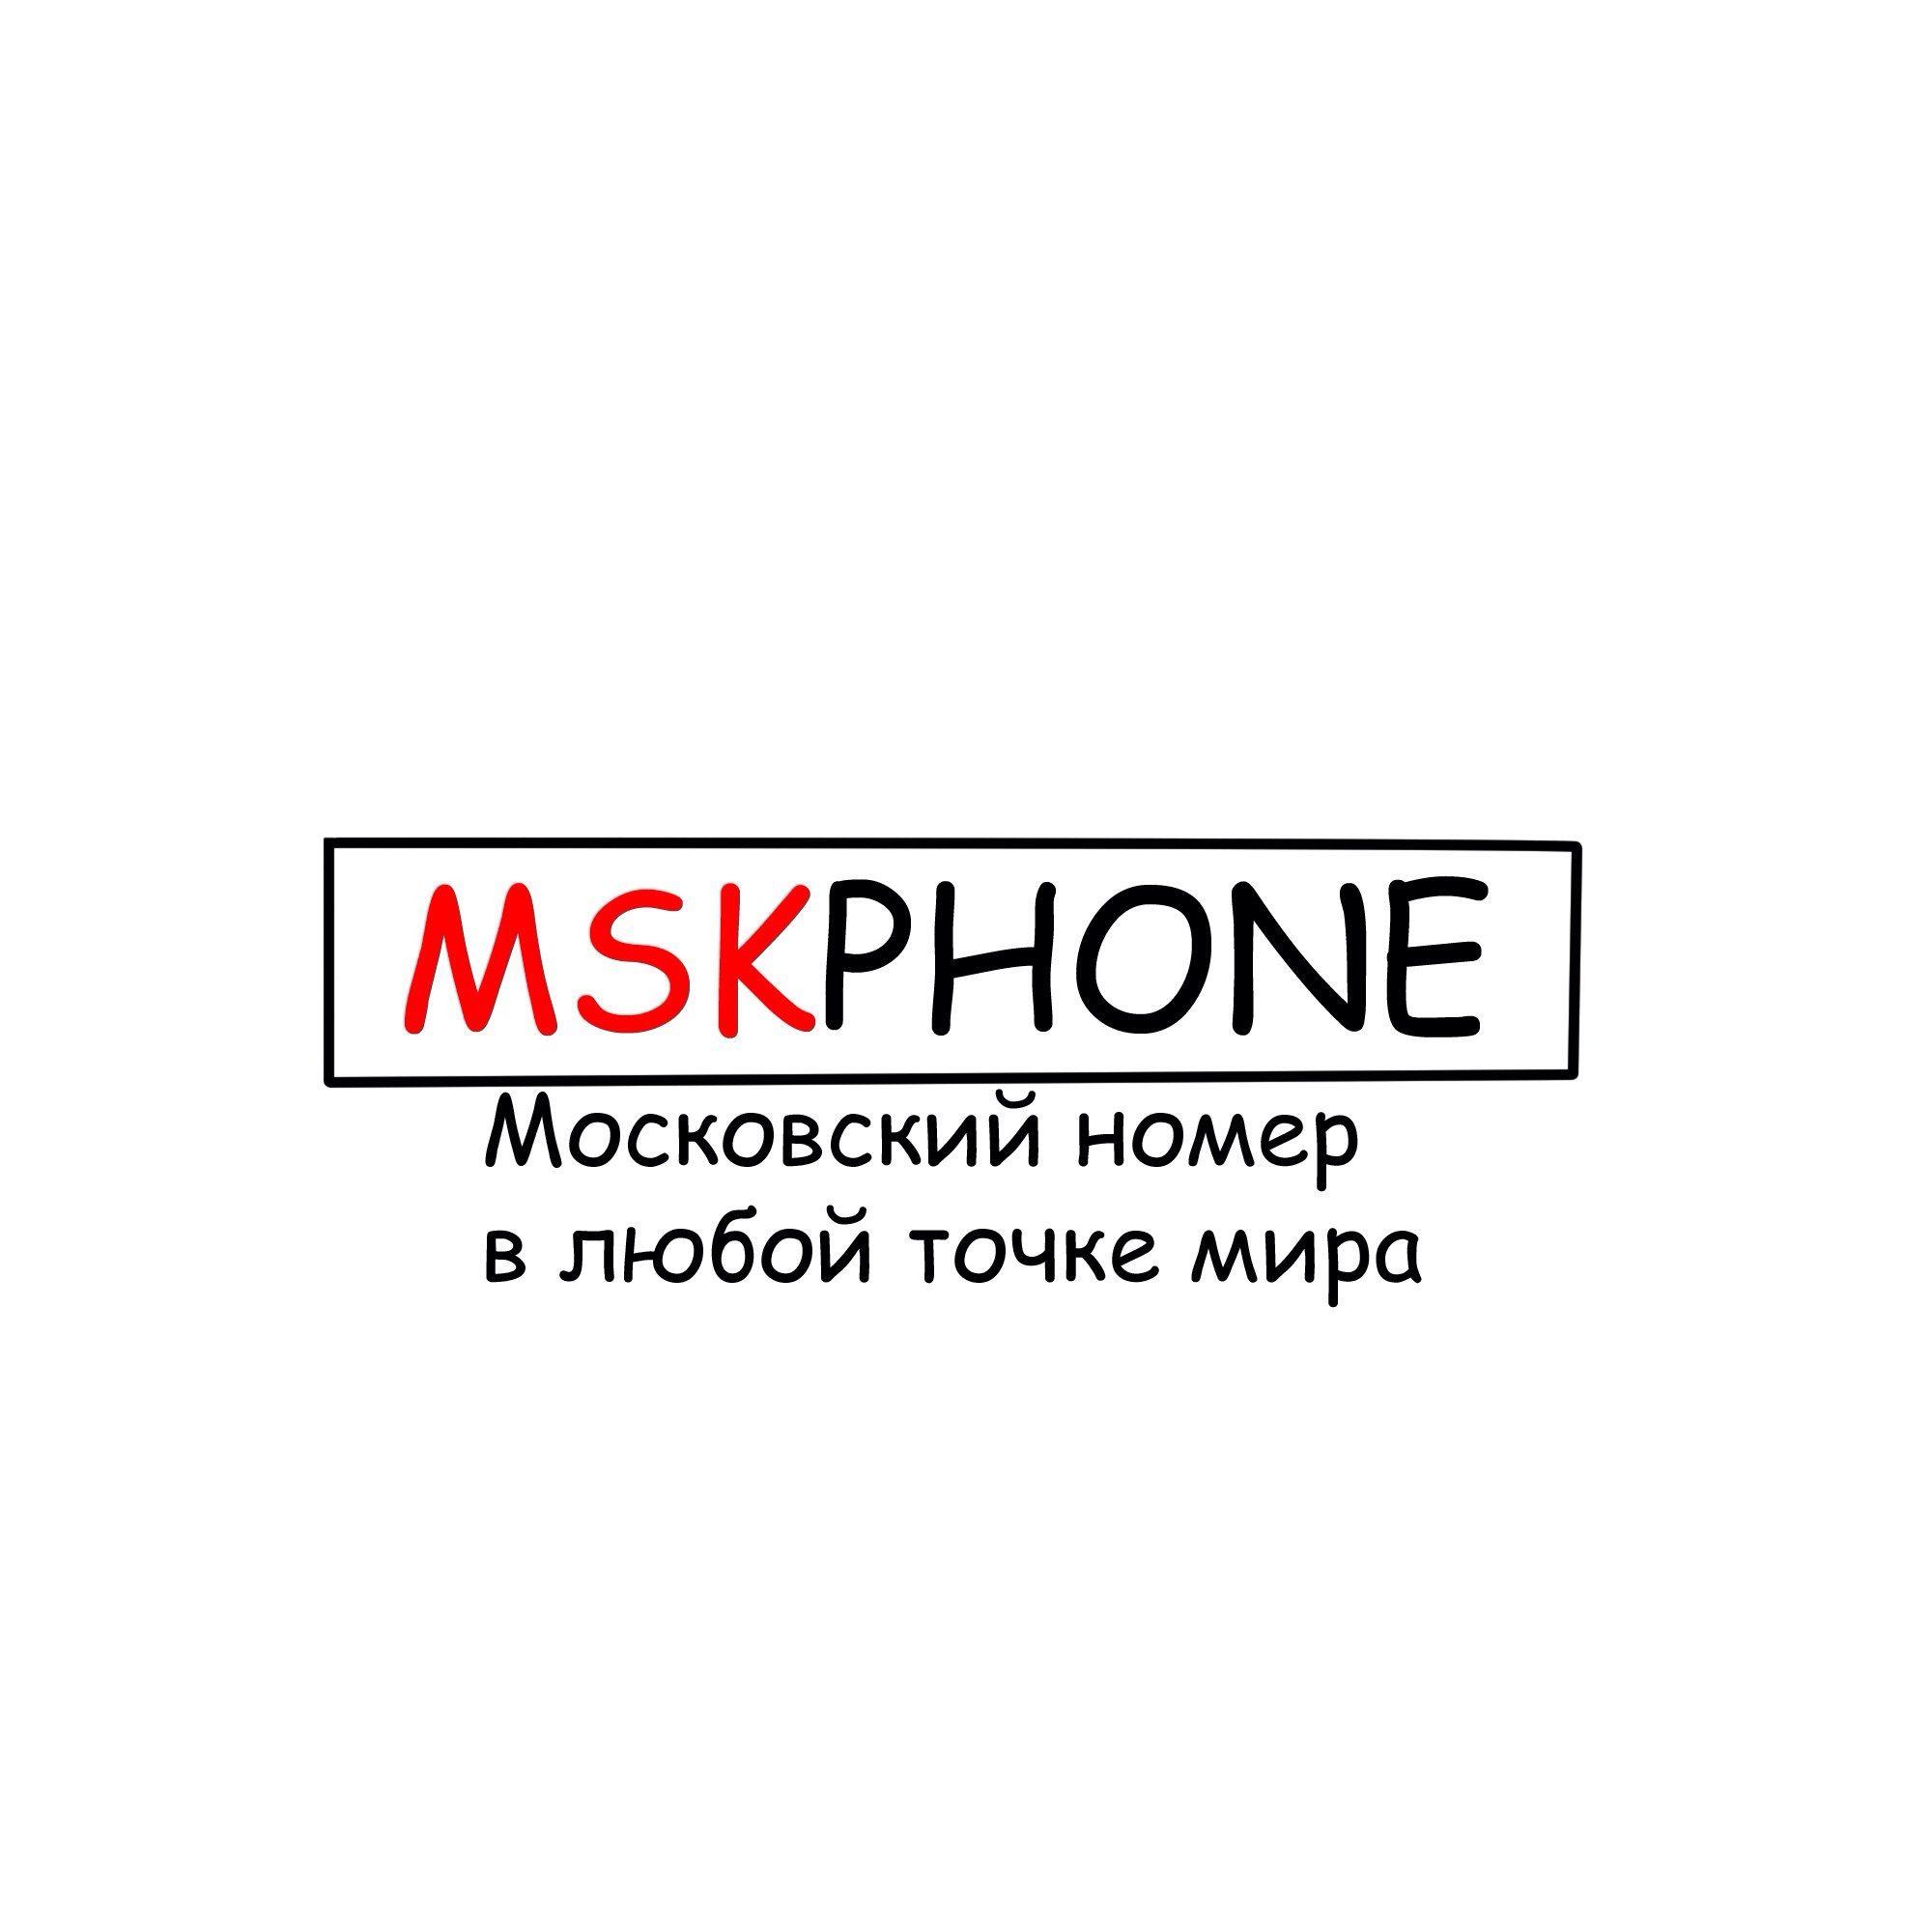 Логотип для MSKPHONE - дизайнер Quazerik